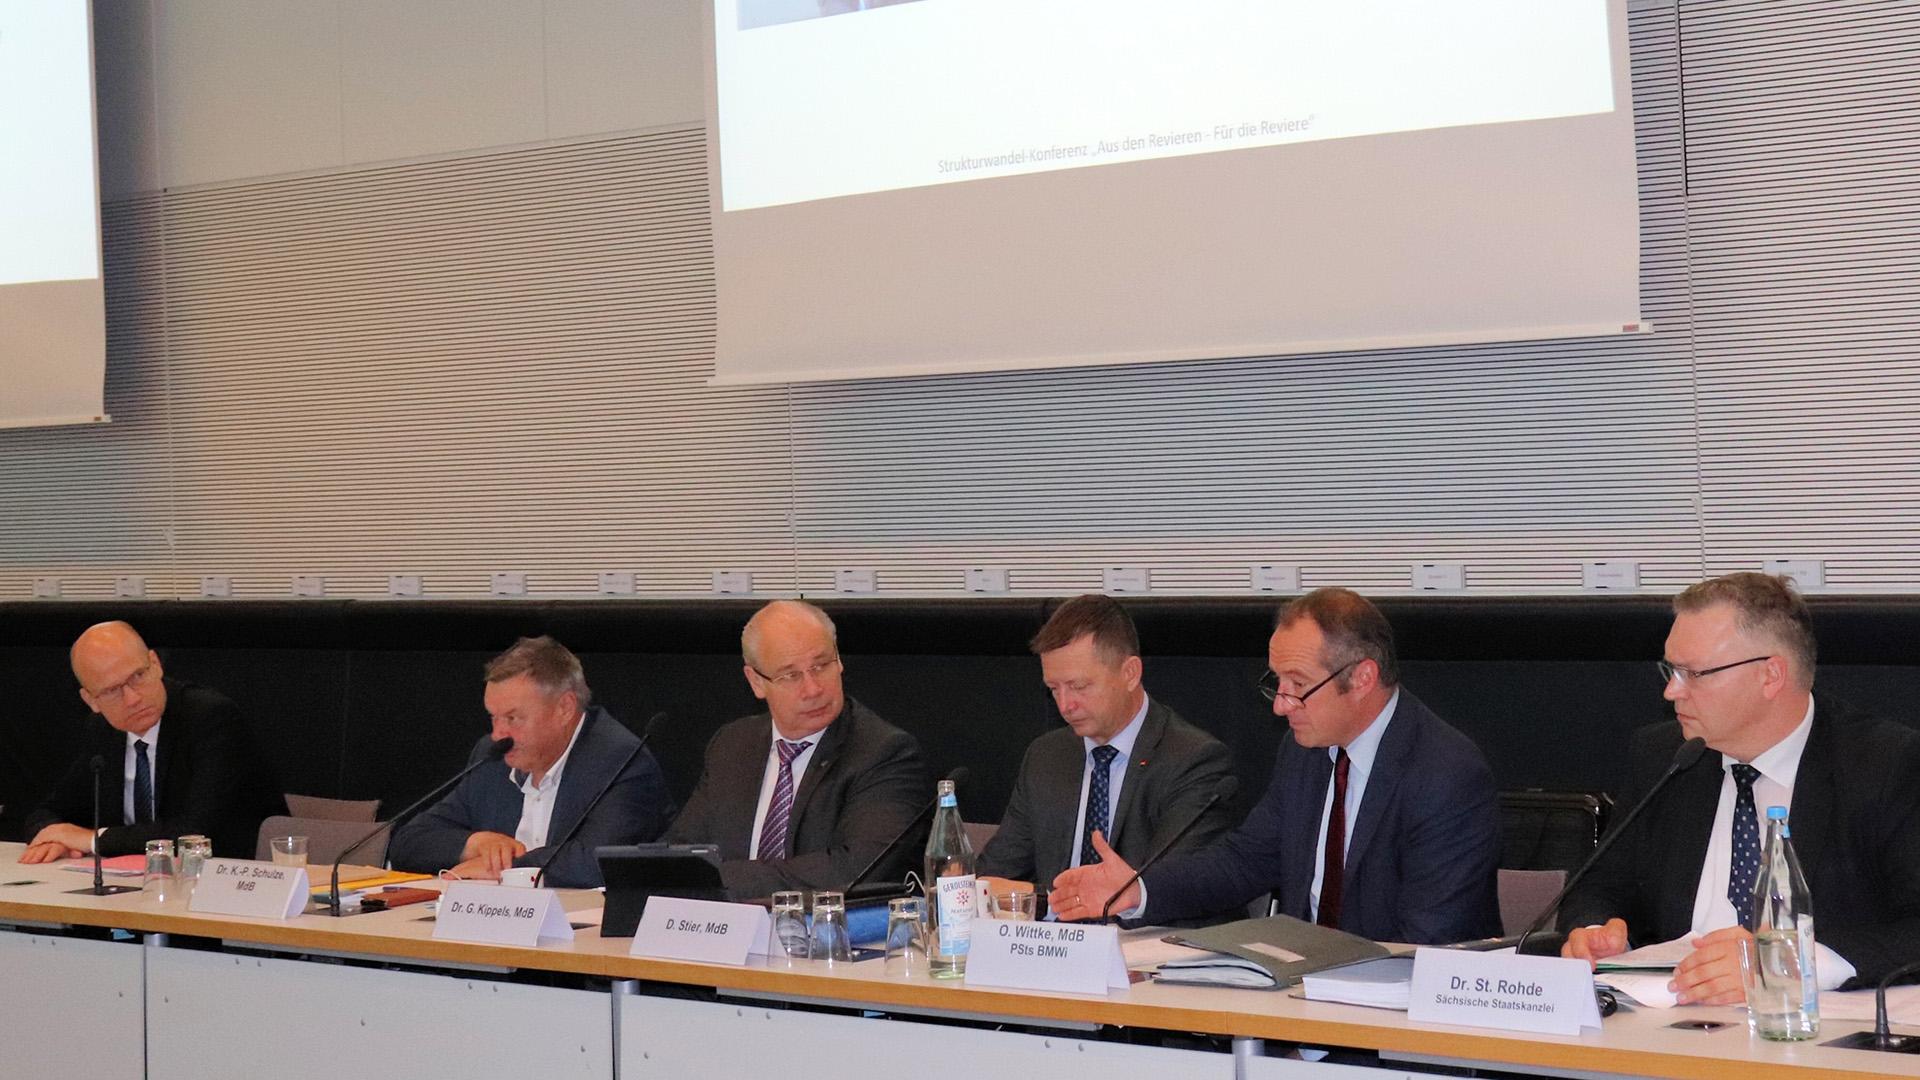 19kw39_Strukturwandel-Konferenz